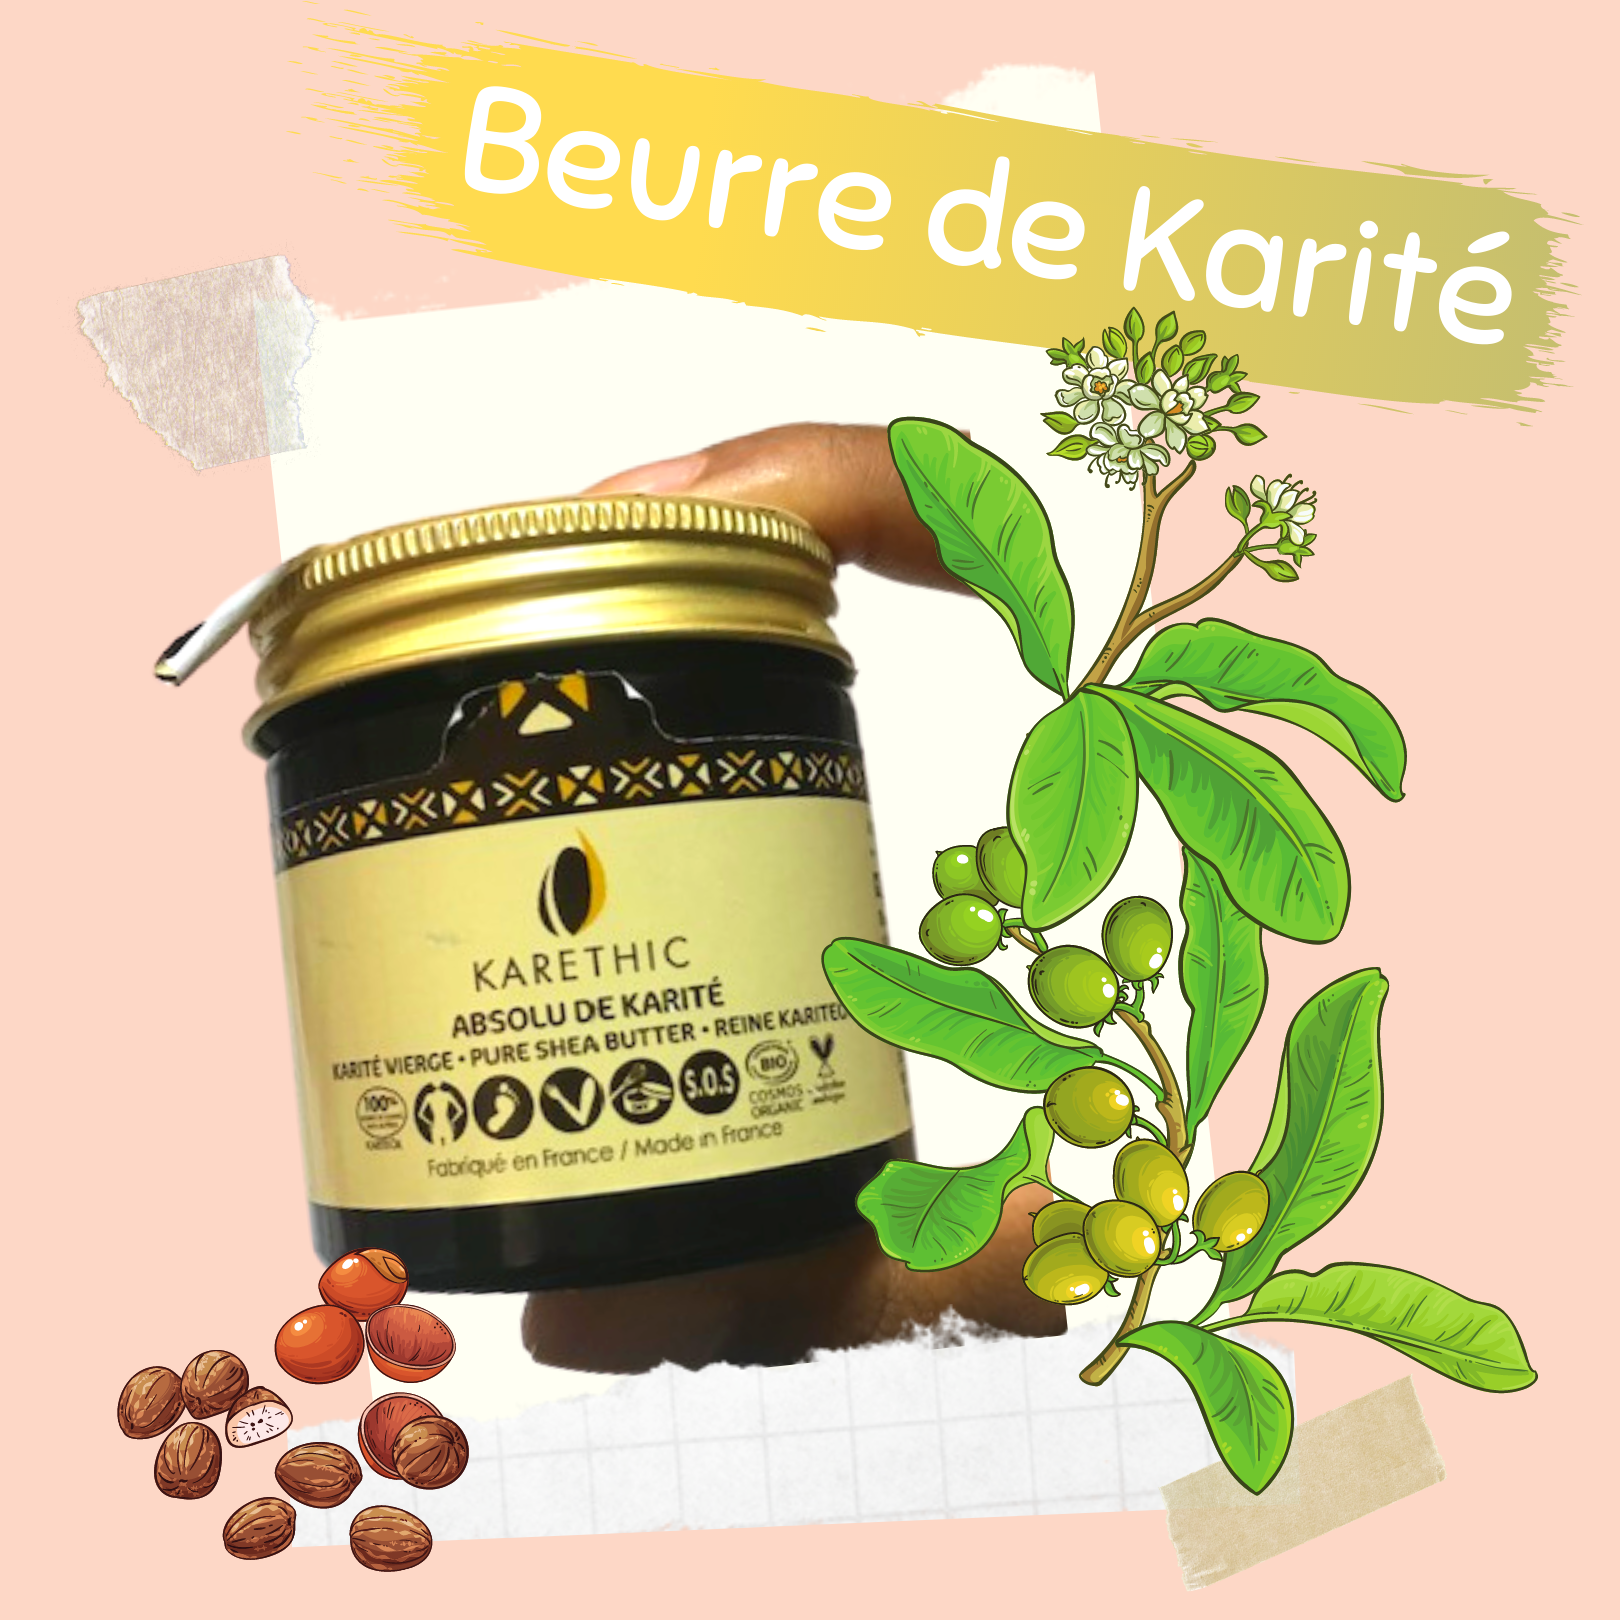 beurre de karite karethic